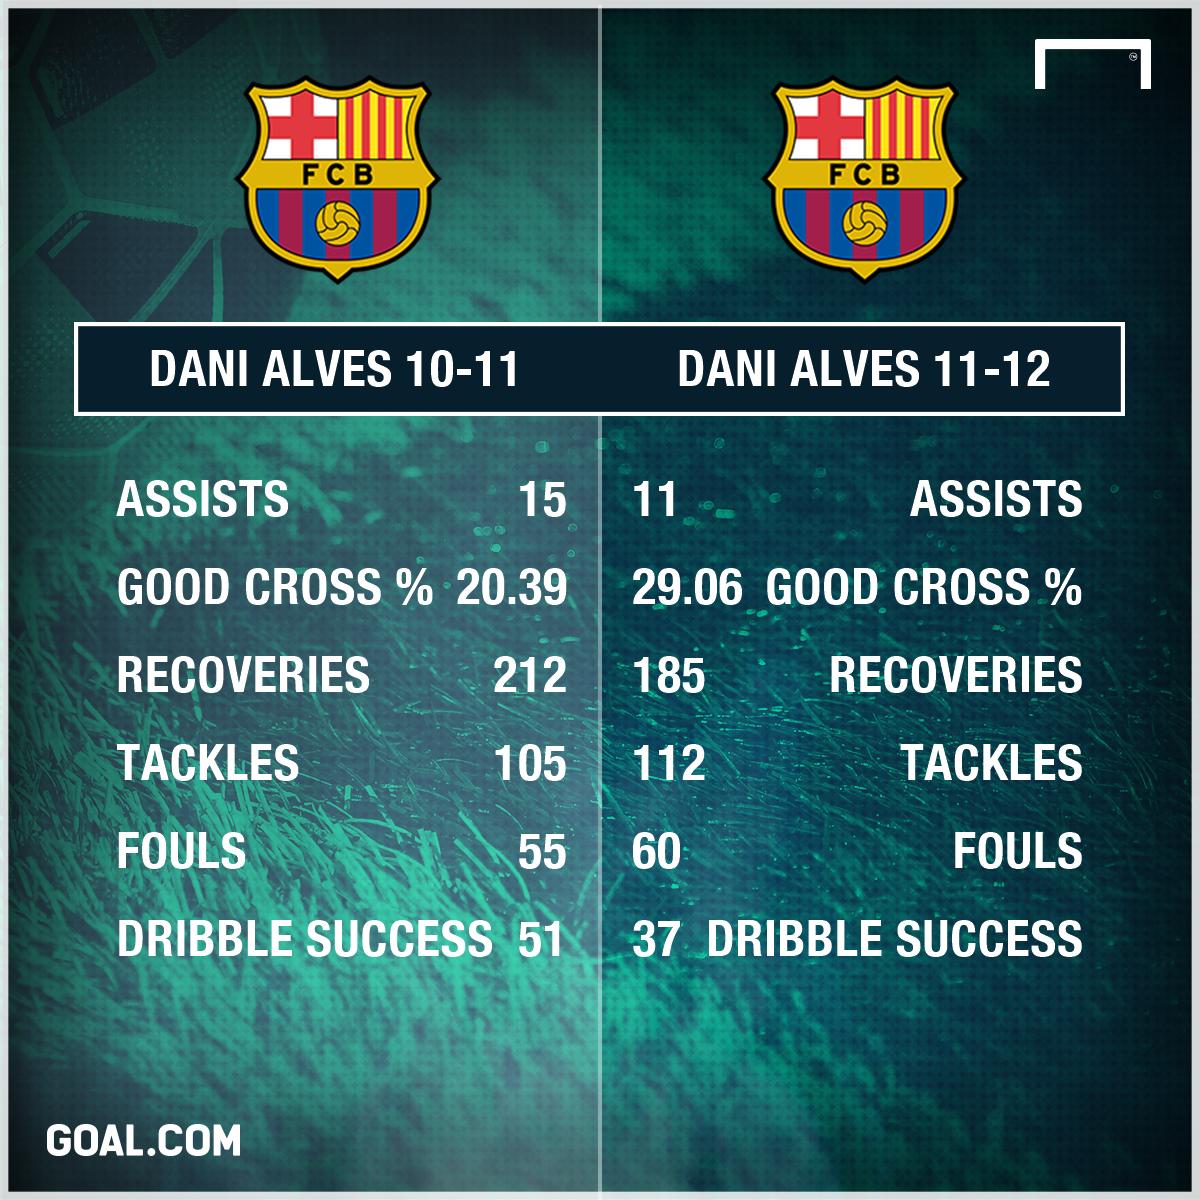 Dani Alves Barcelona 2010 2012